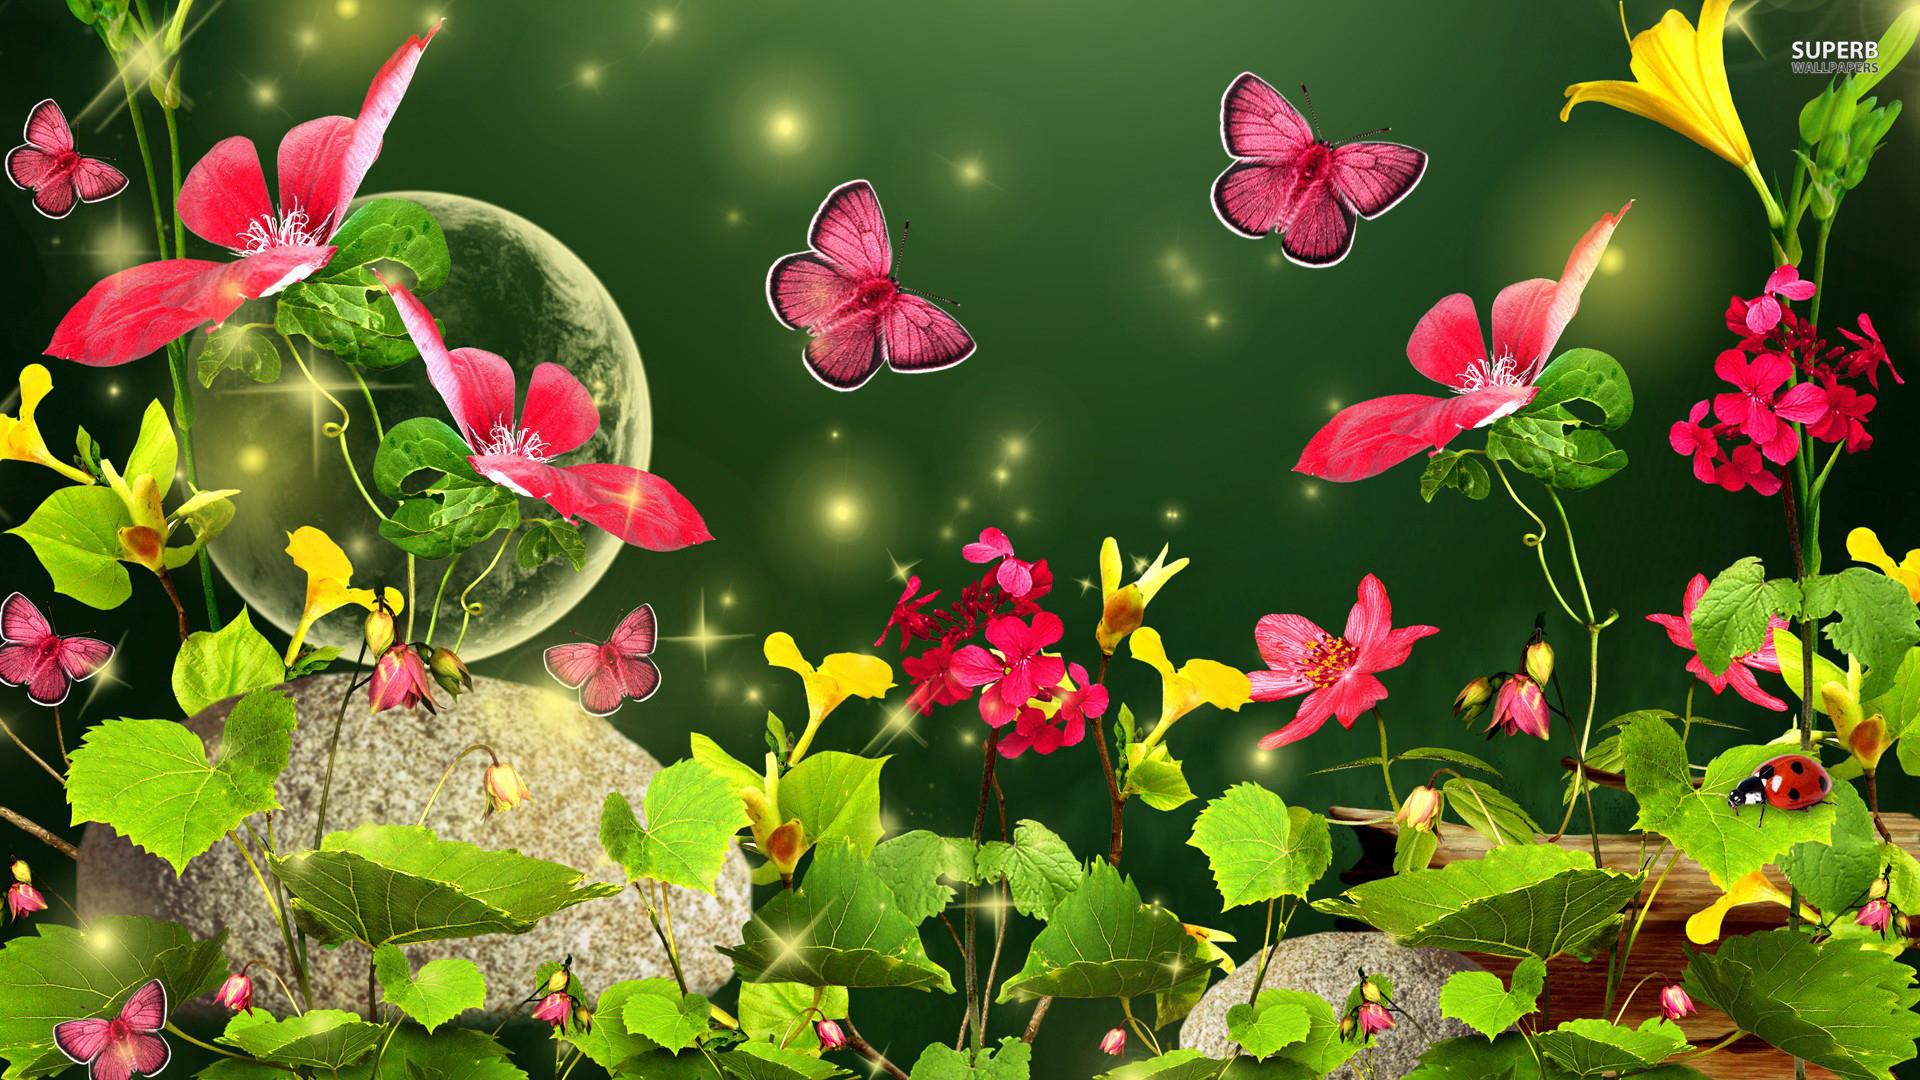 Butterfly Paintings HD wallpaper | HD Latest Wallpapers | Pinterest | Hd  wallpaper, Wallpaper and Paintings